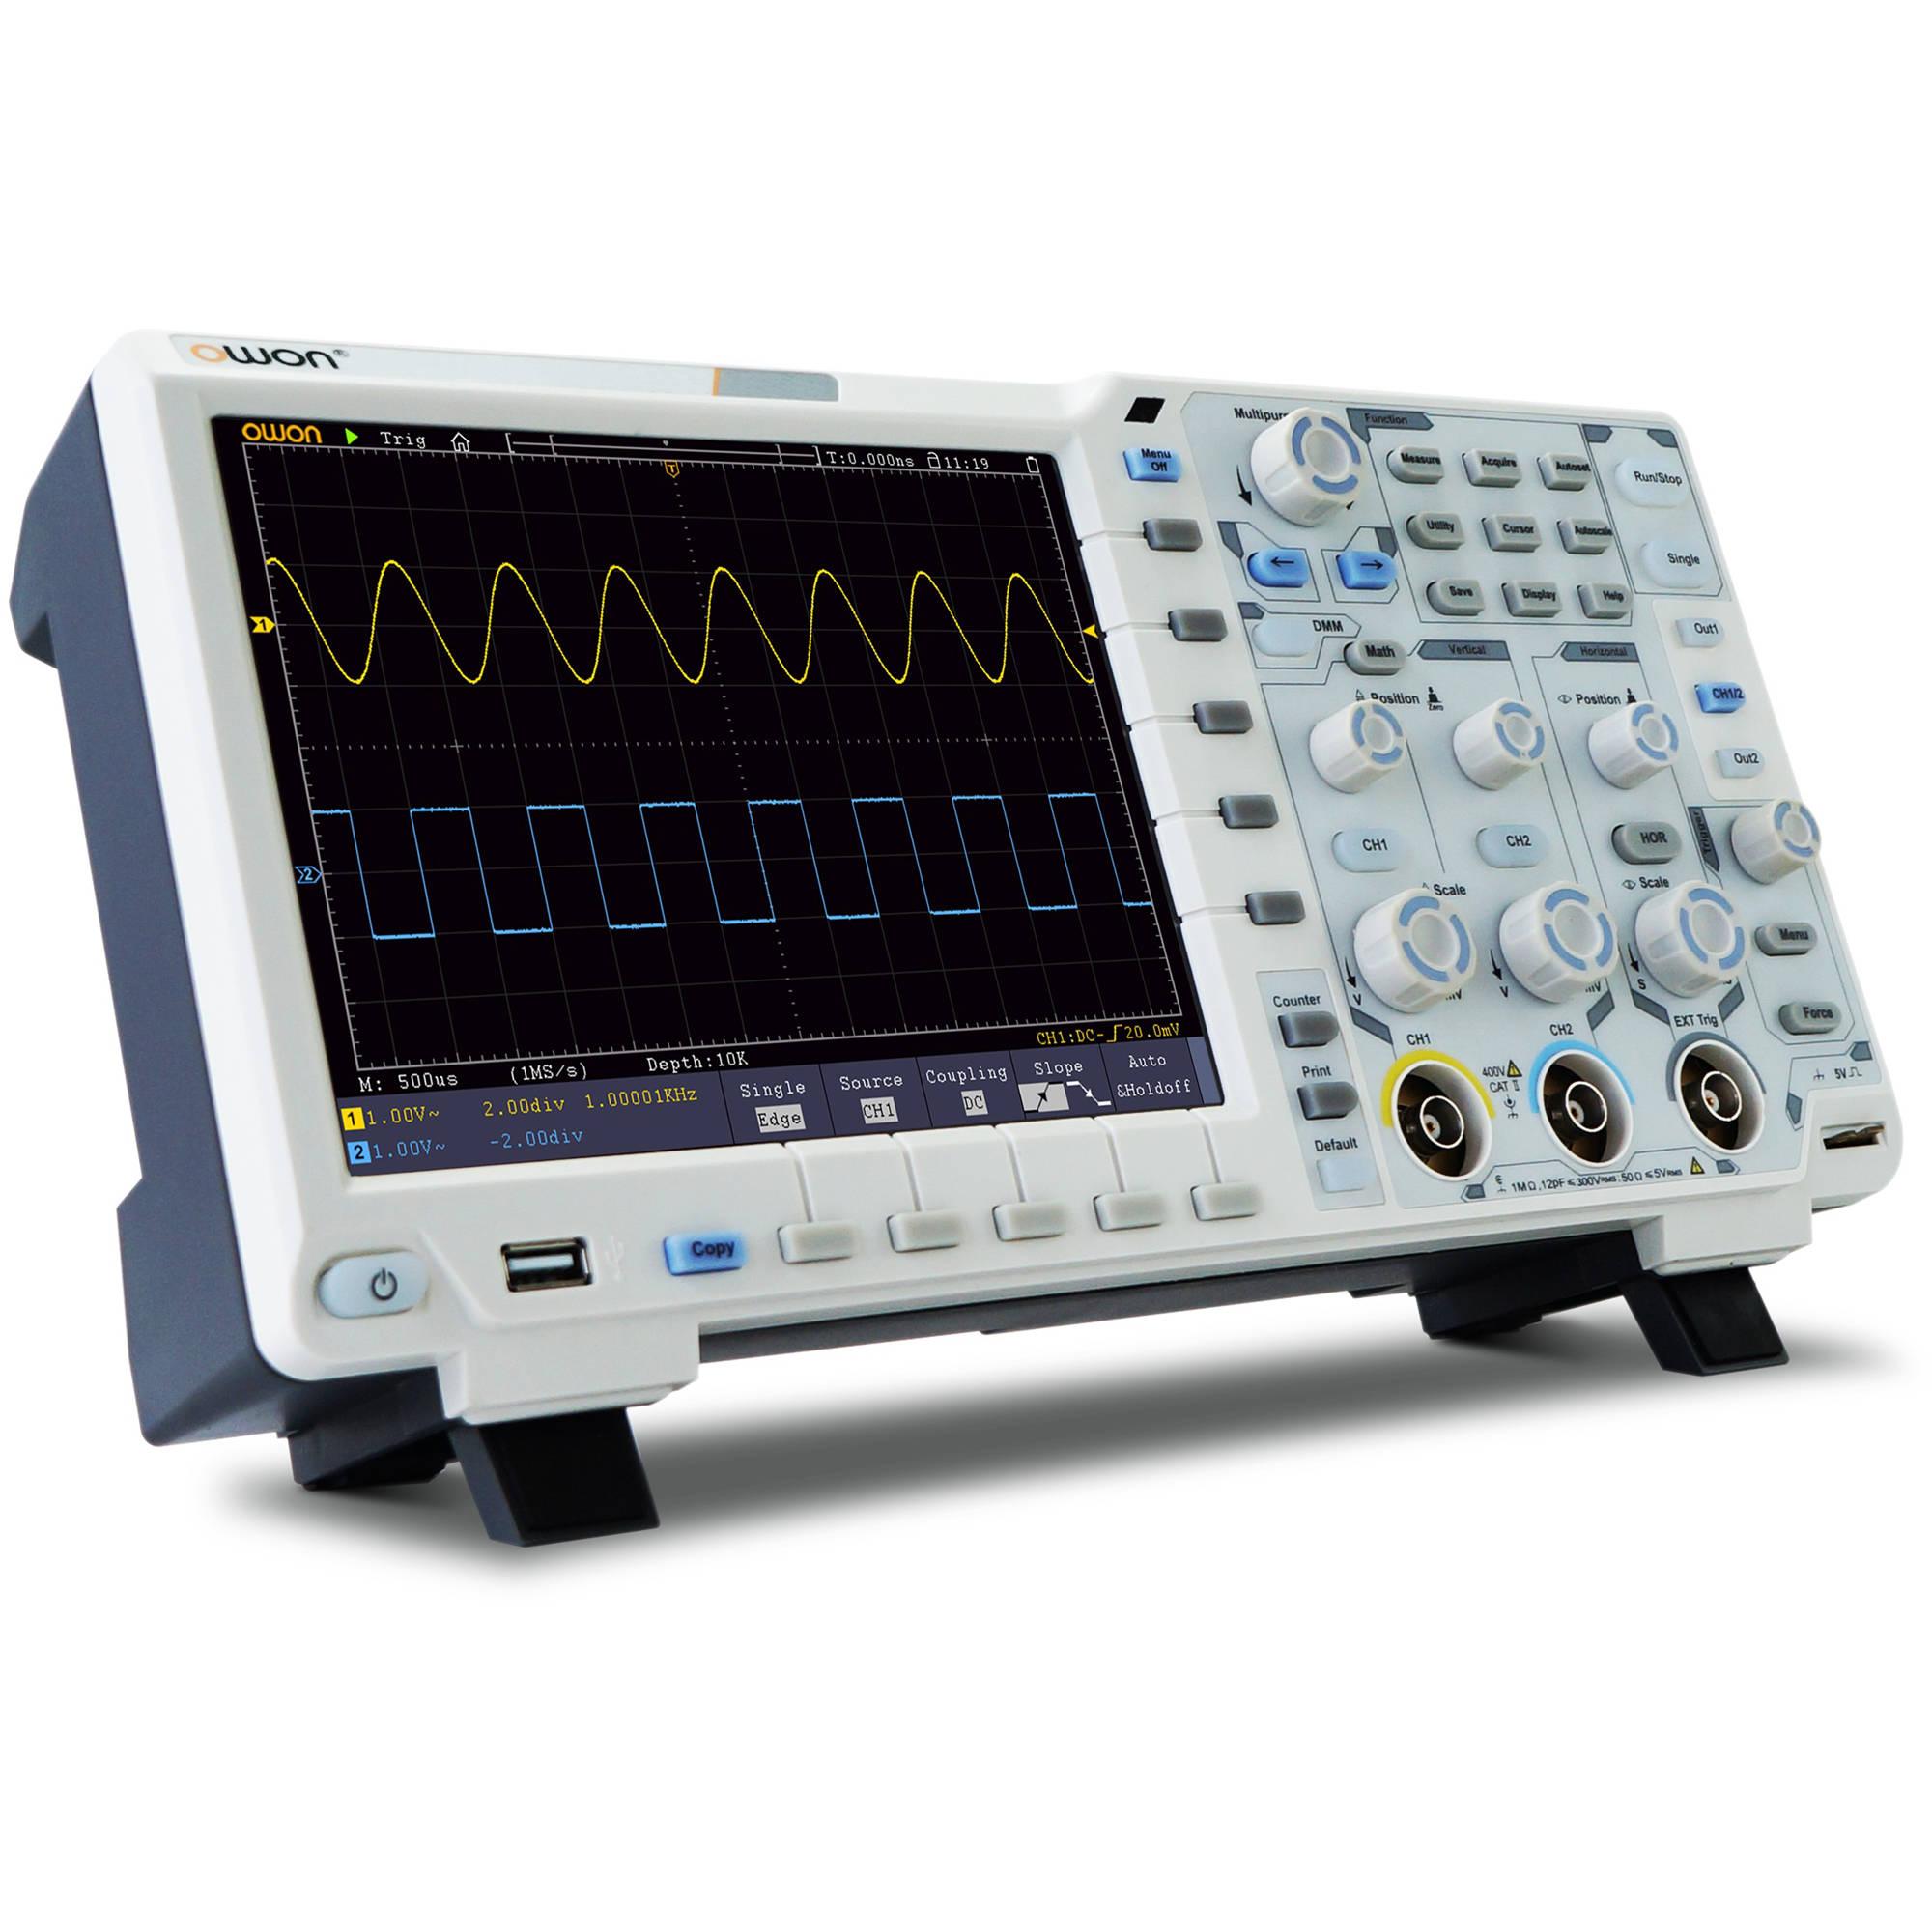 Oscilloscope Image Of B : Owon technology xds n in digital storage oscilloscope